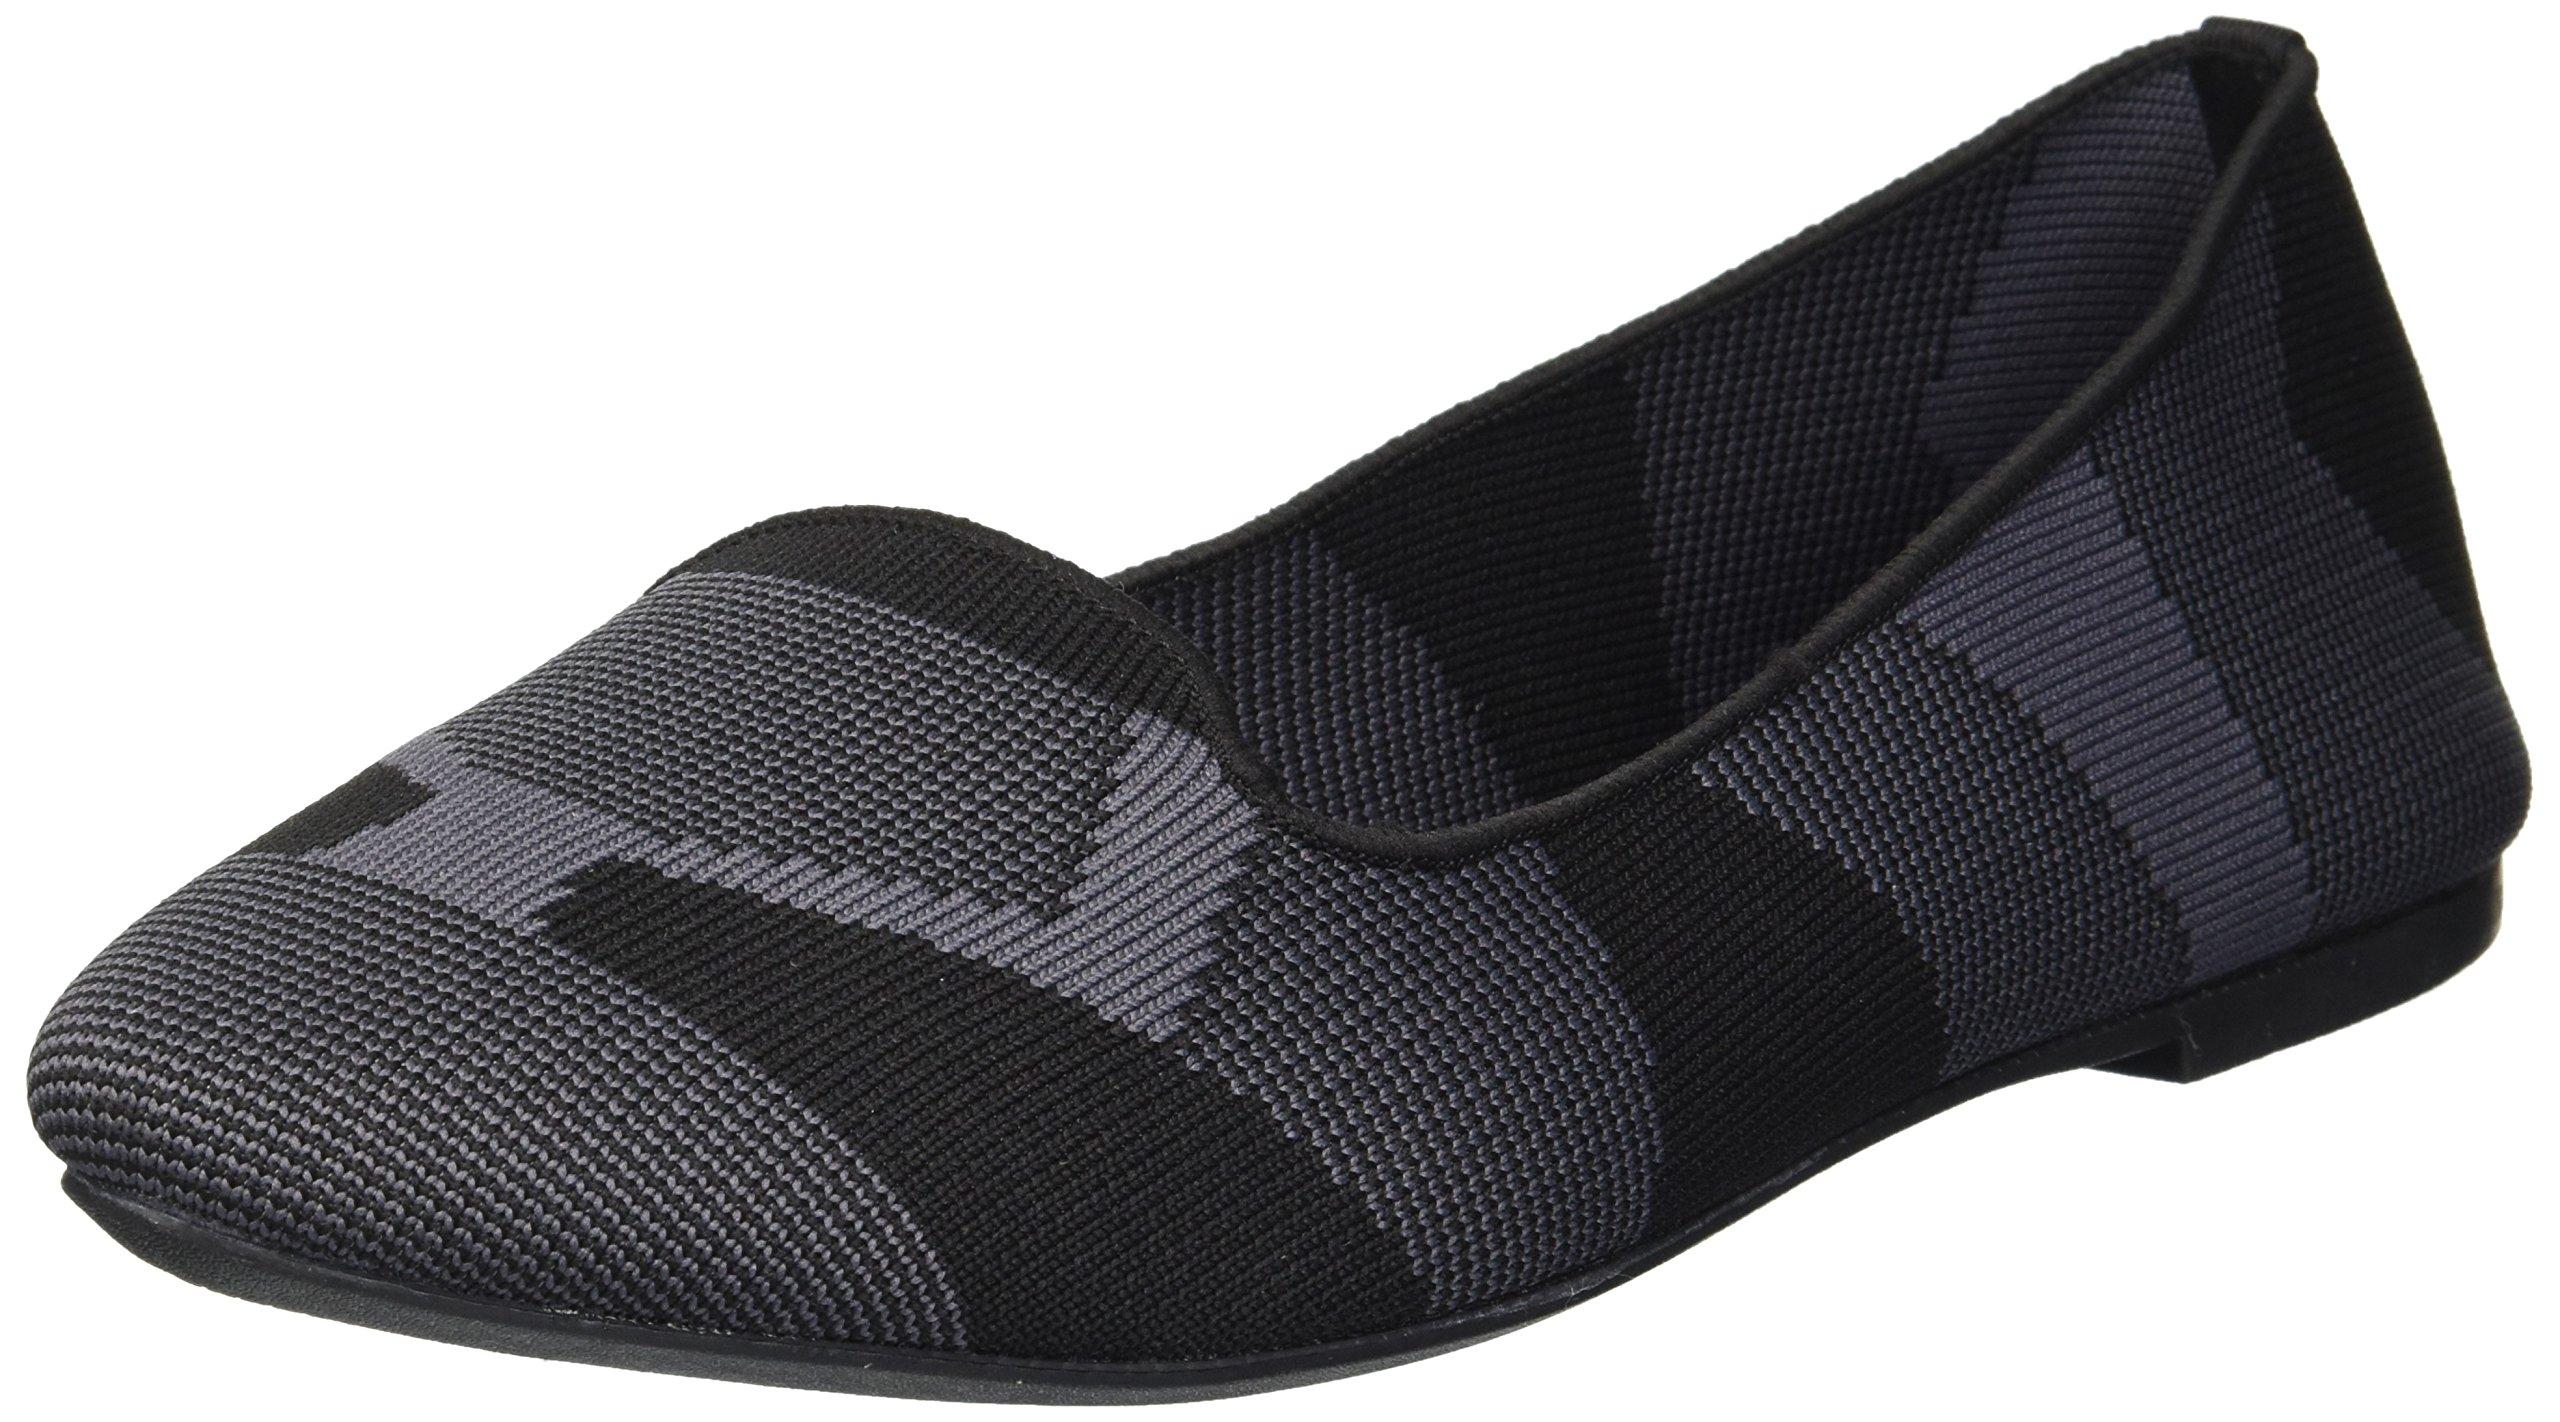 Skechers Women's Cleo-Sherlock-Engineered Knit Loafer Skimmer Ballet Flat, Black, 8.5 M US by Skechers